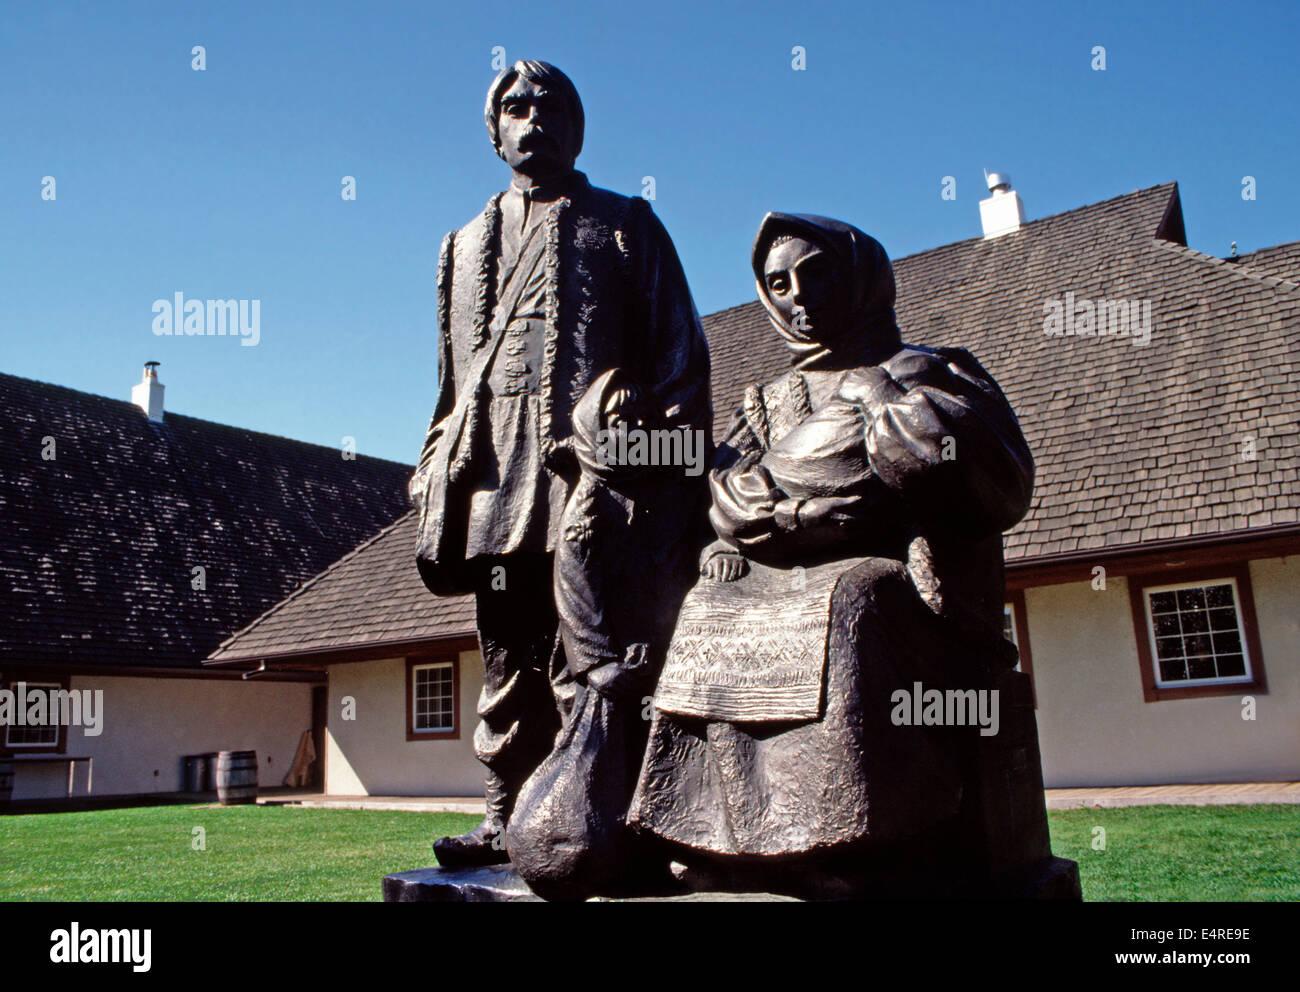 Bronzes of the Ukrainian people settling the Canadian prairies,Ukrainian Cultural Heritage Village,Edmonton,Alberta - Stock Image